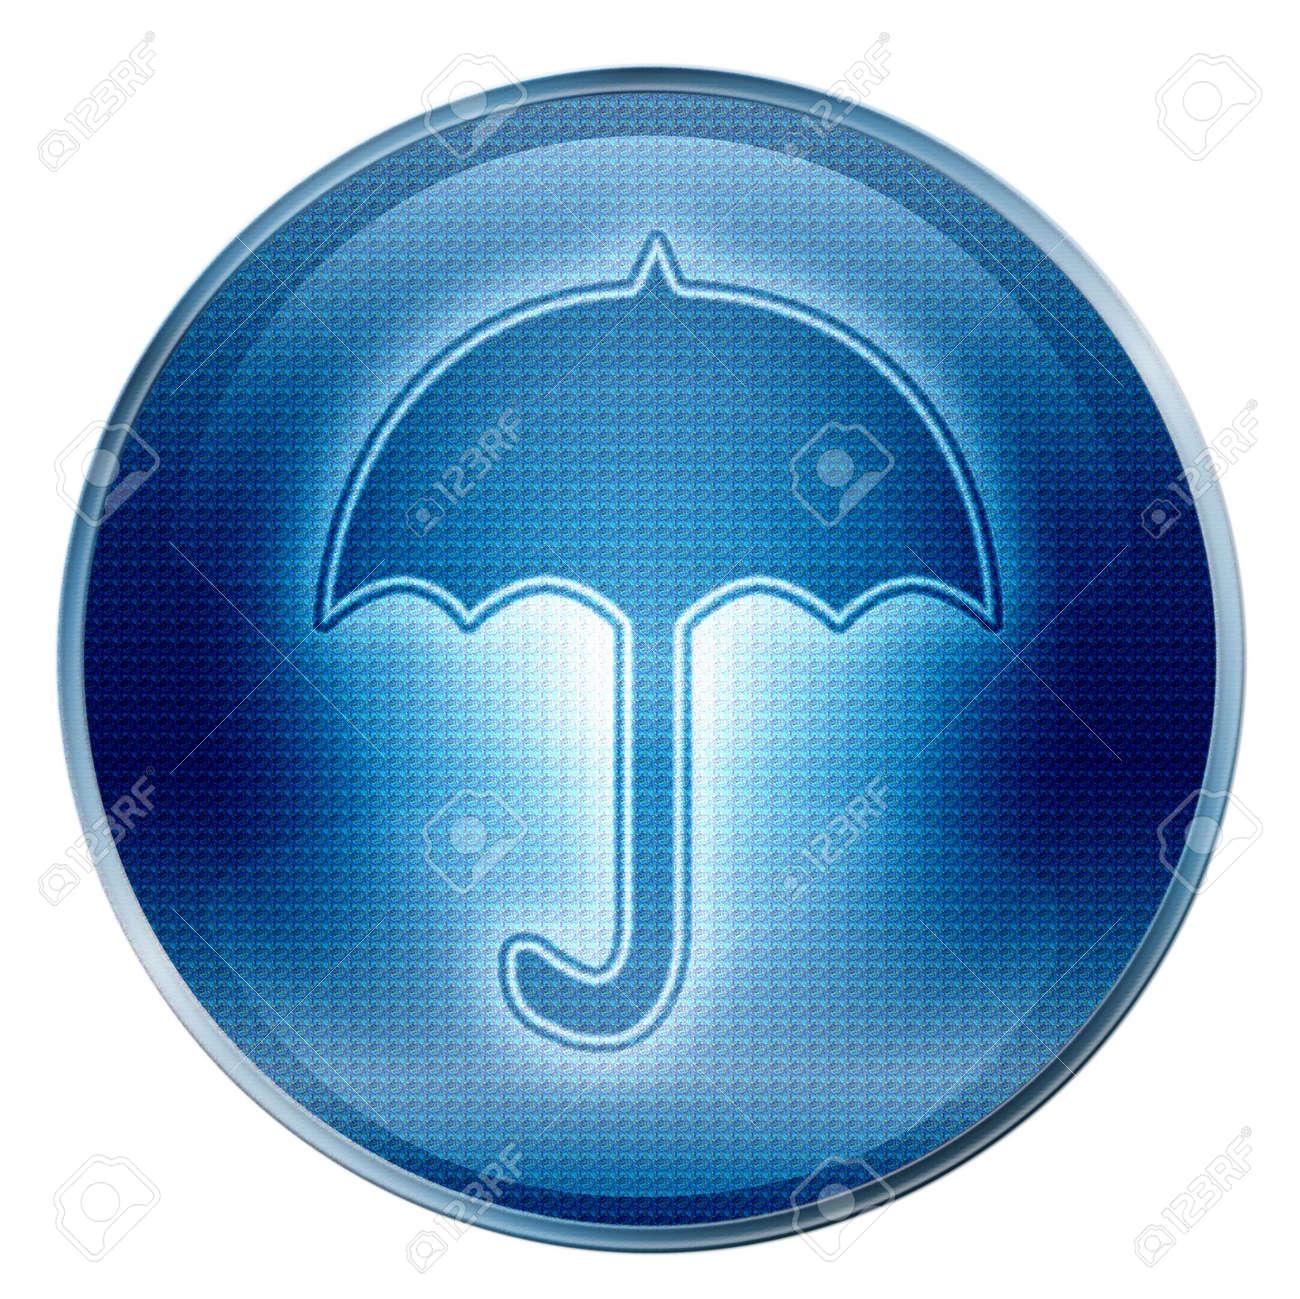 Umbrella icon. (With Clipping Path) Stock Photo - 997858